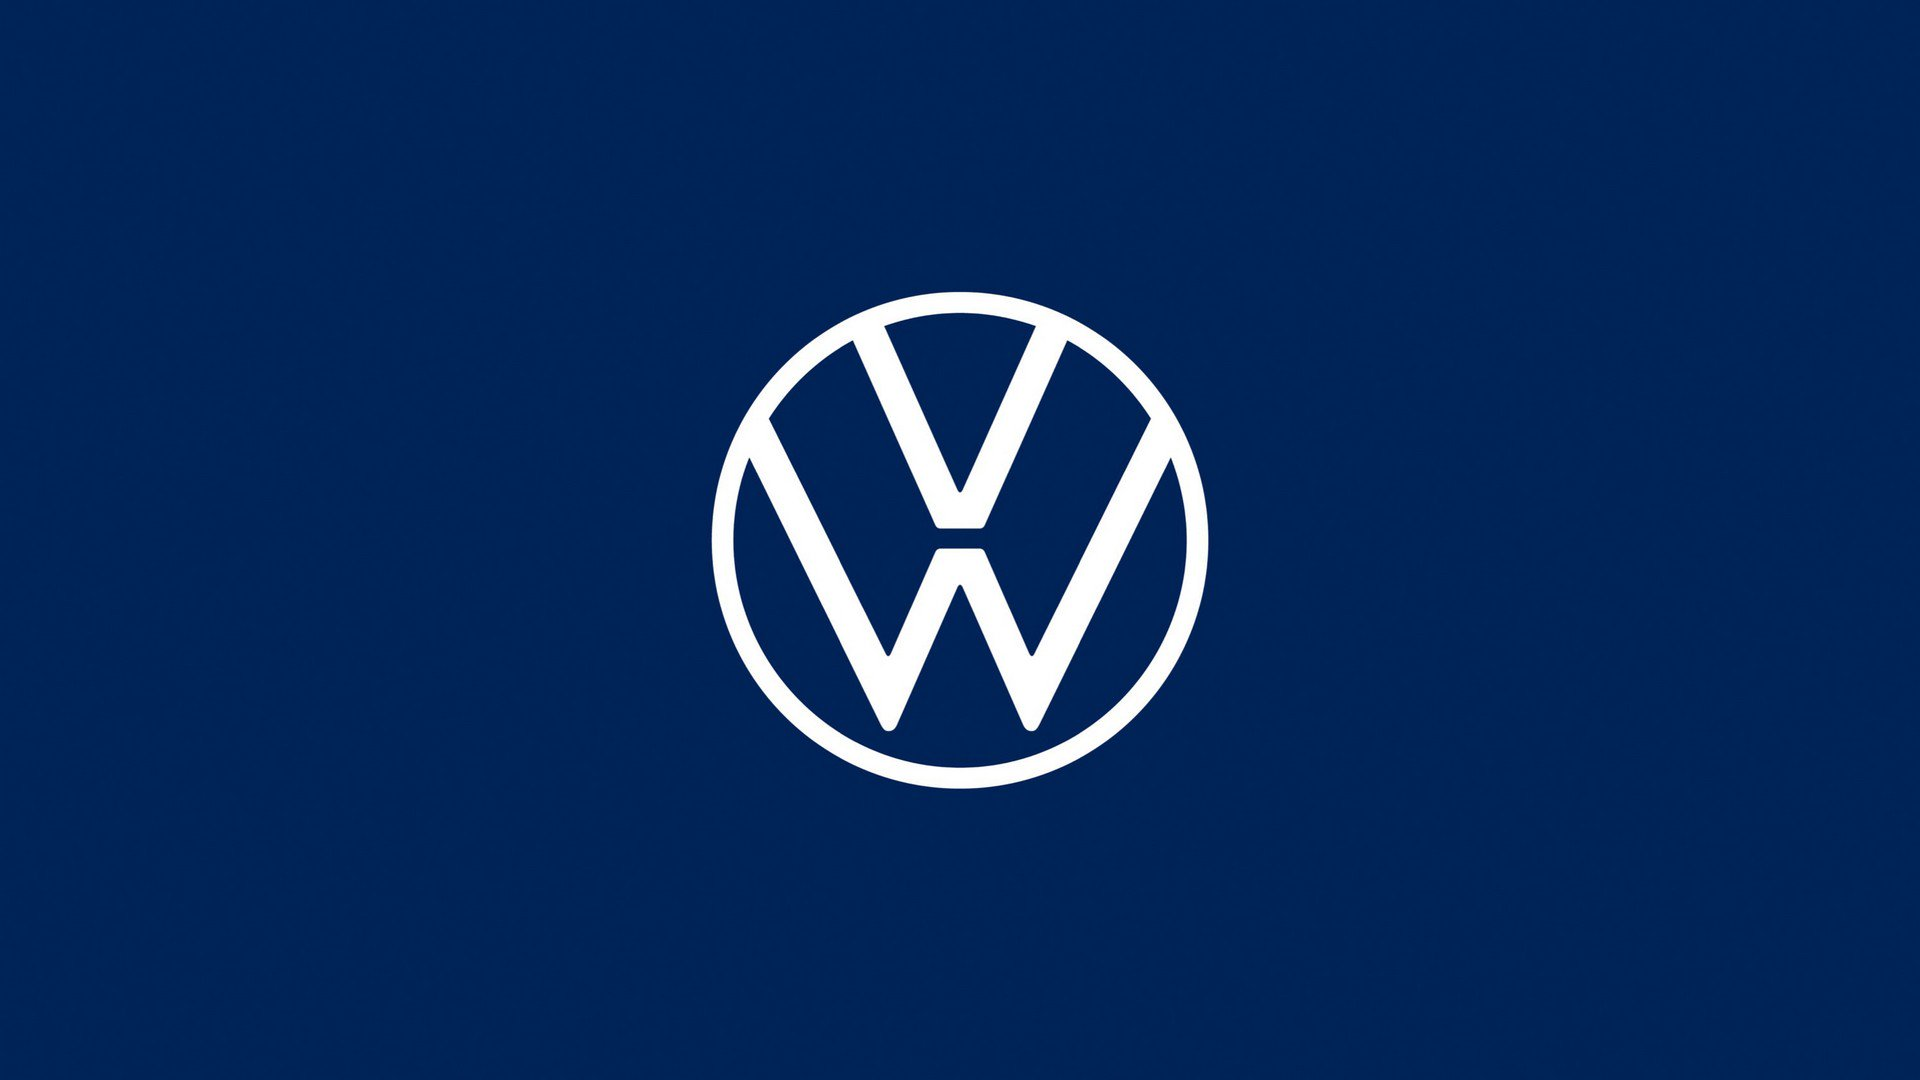 logo mới Volkswagen